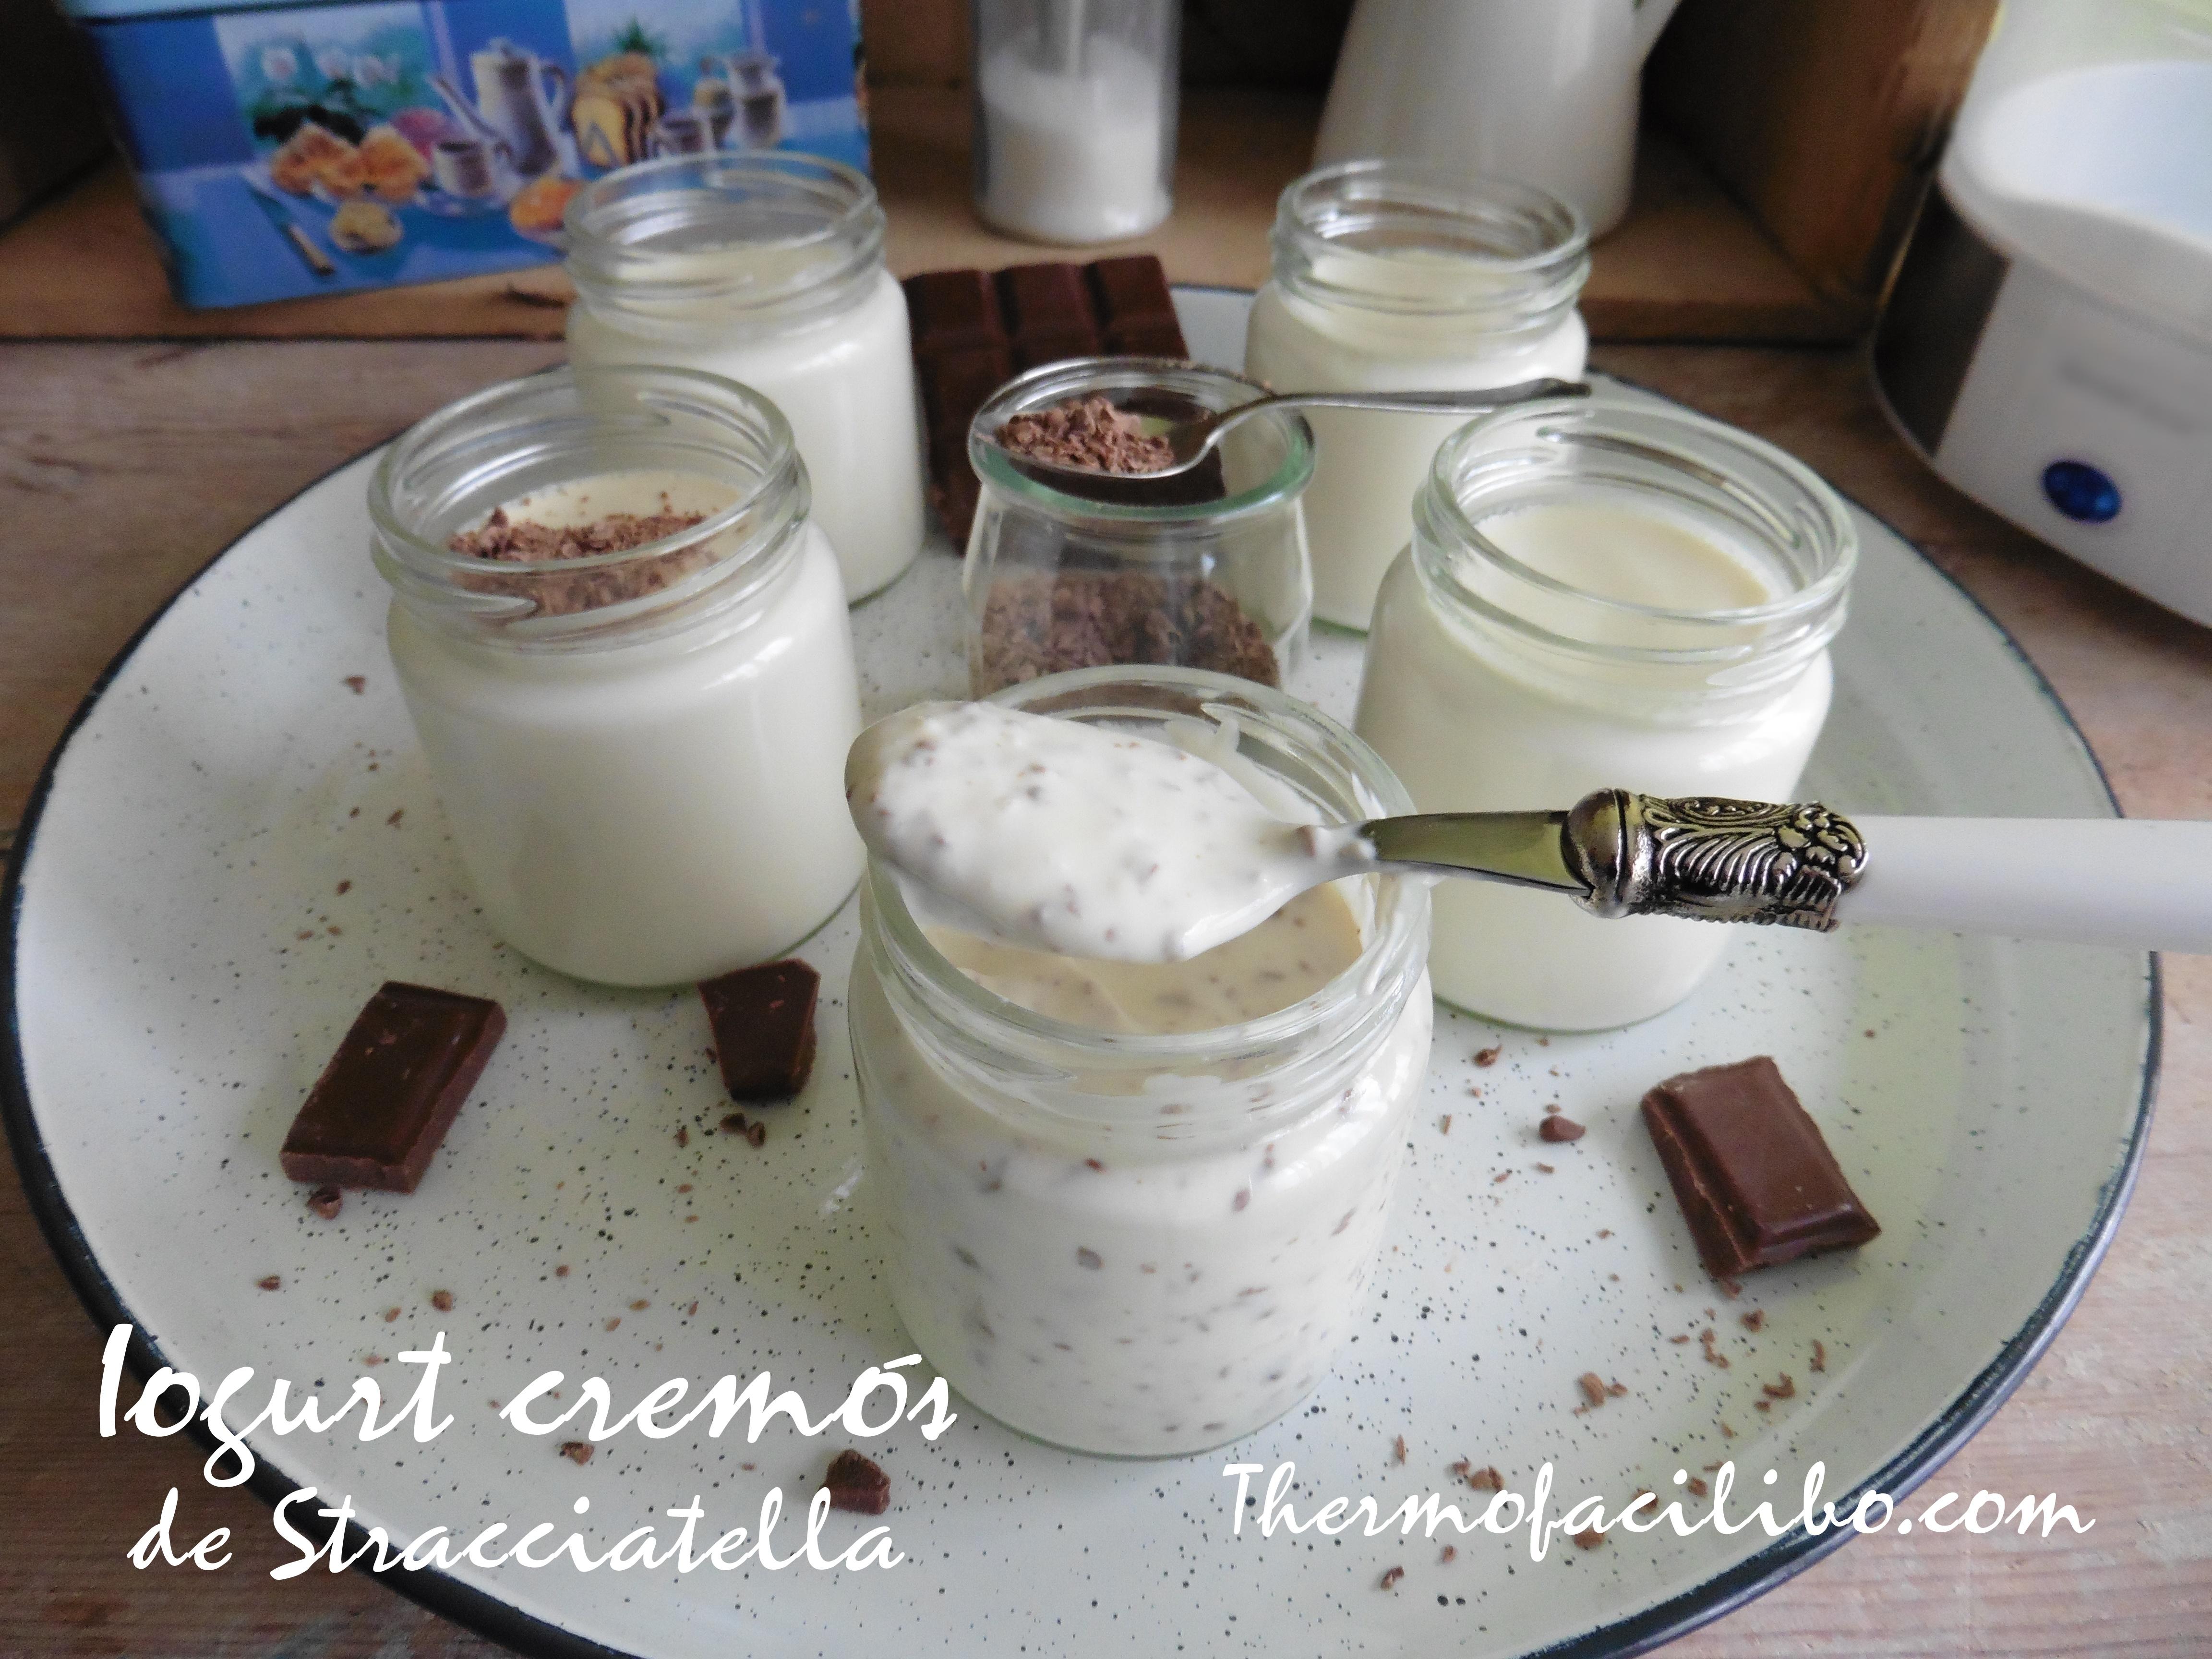 Iogurt cremós de Stracciatella.-